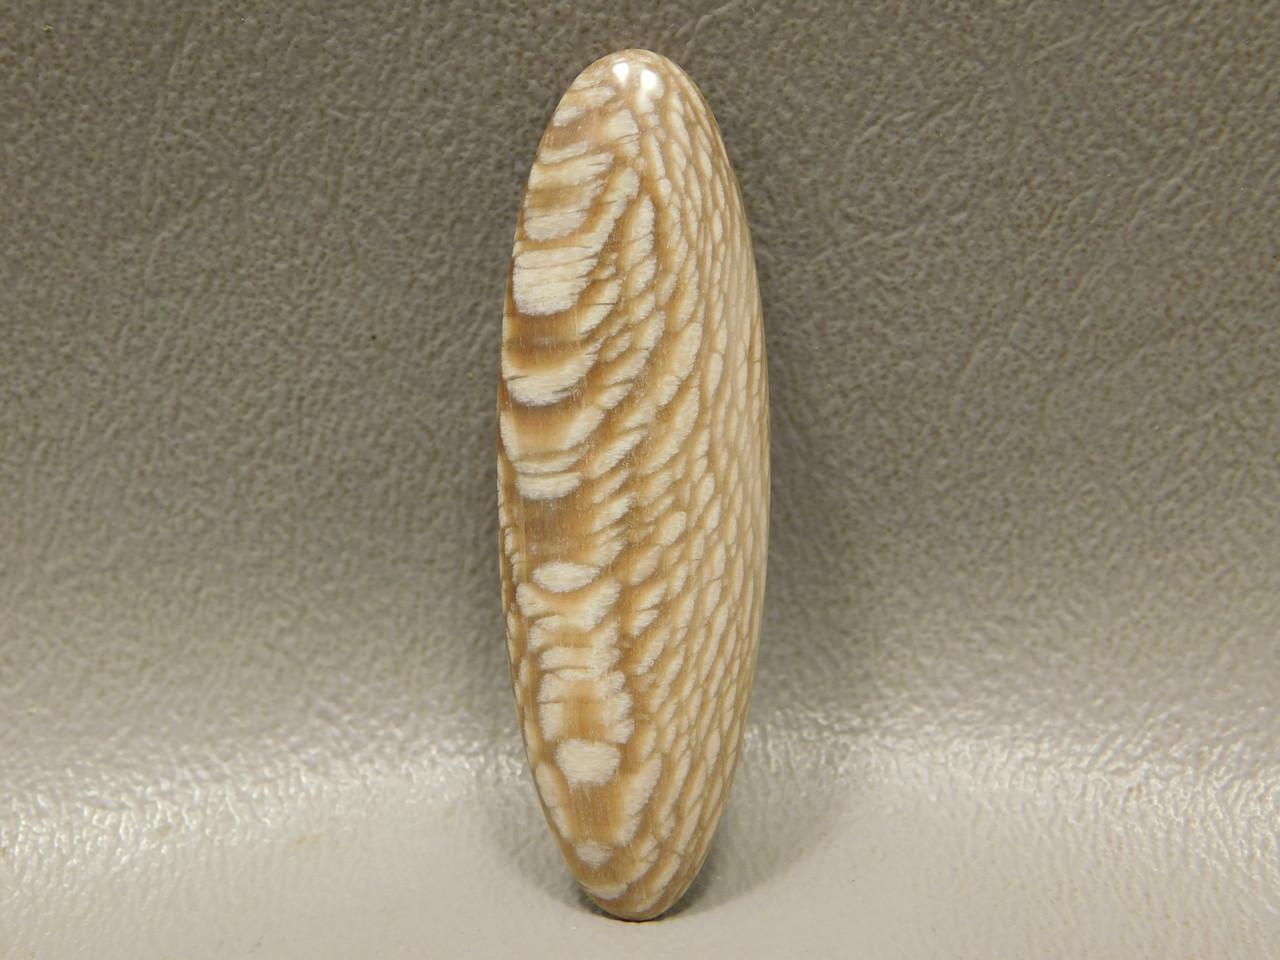 Petrified Sycamore Wood Cabochon Stone Petrified Sycamore Wood Cabochon Badger Pocket Fossil #12